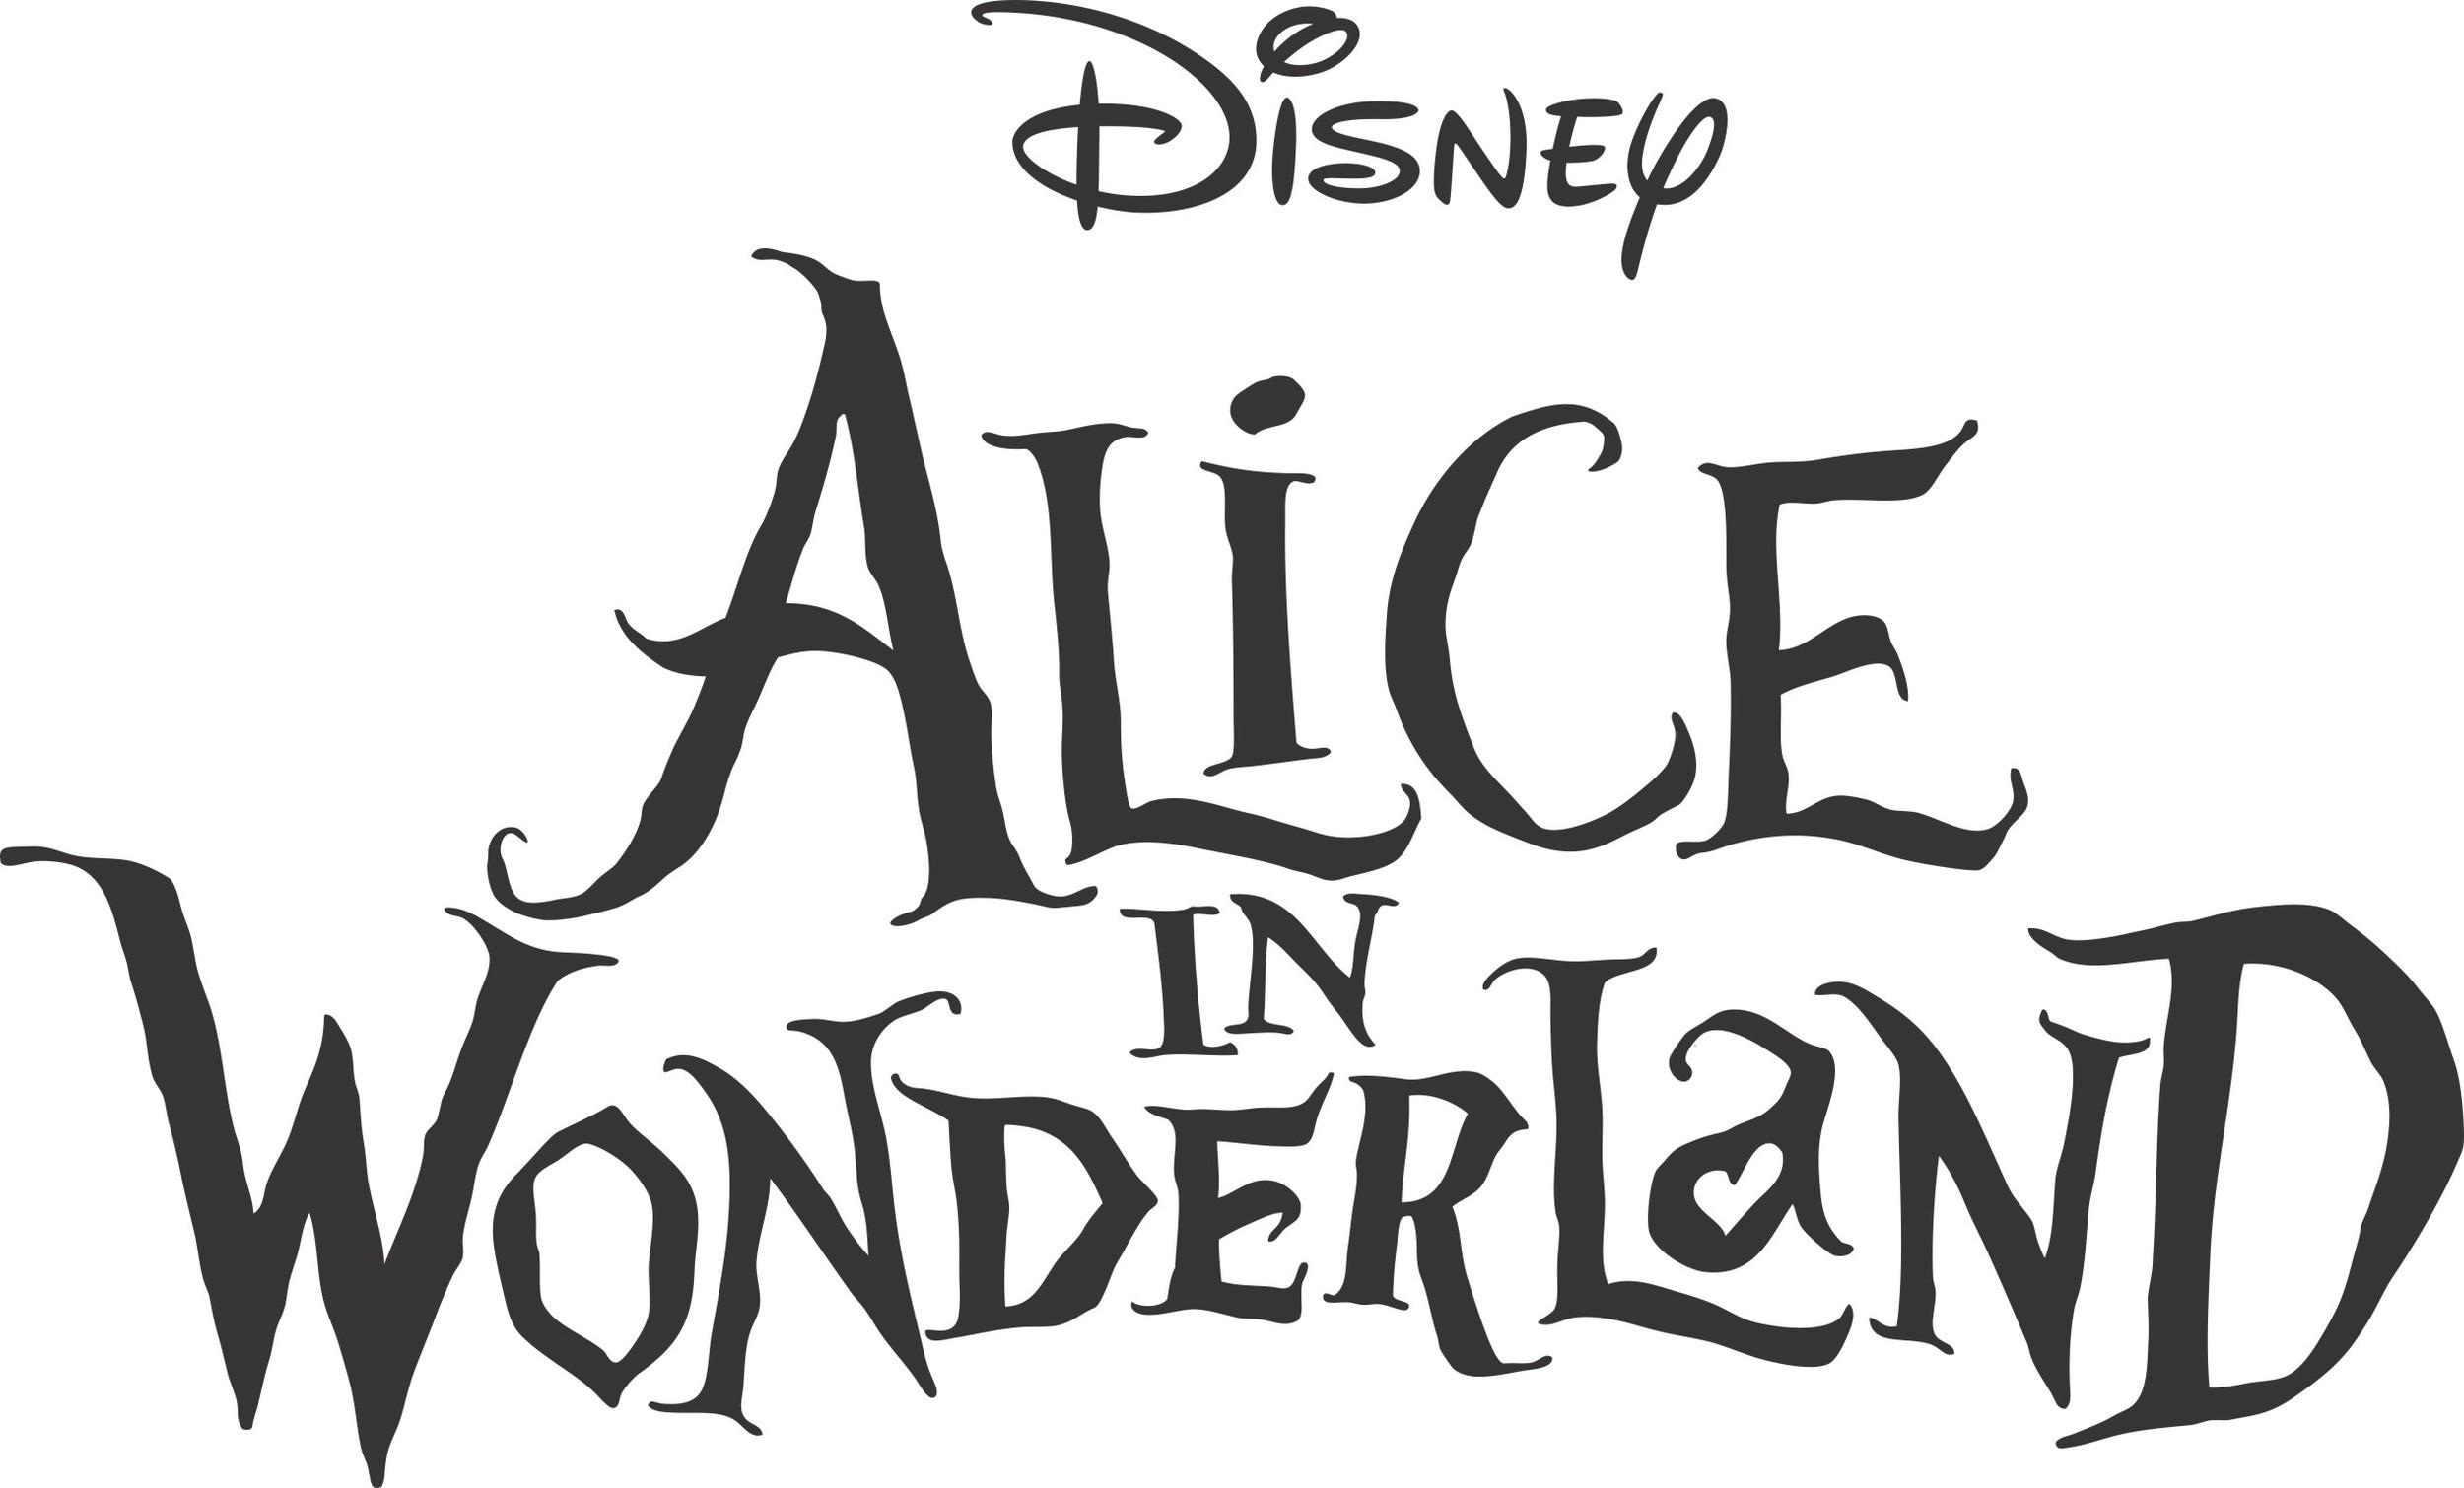 Alice_English_Logo_vector-p4i20uj1paacns1tgt1ii81a7i4.jpg